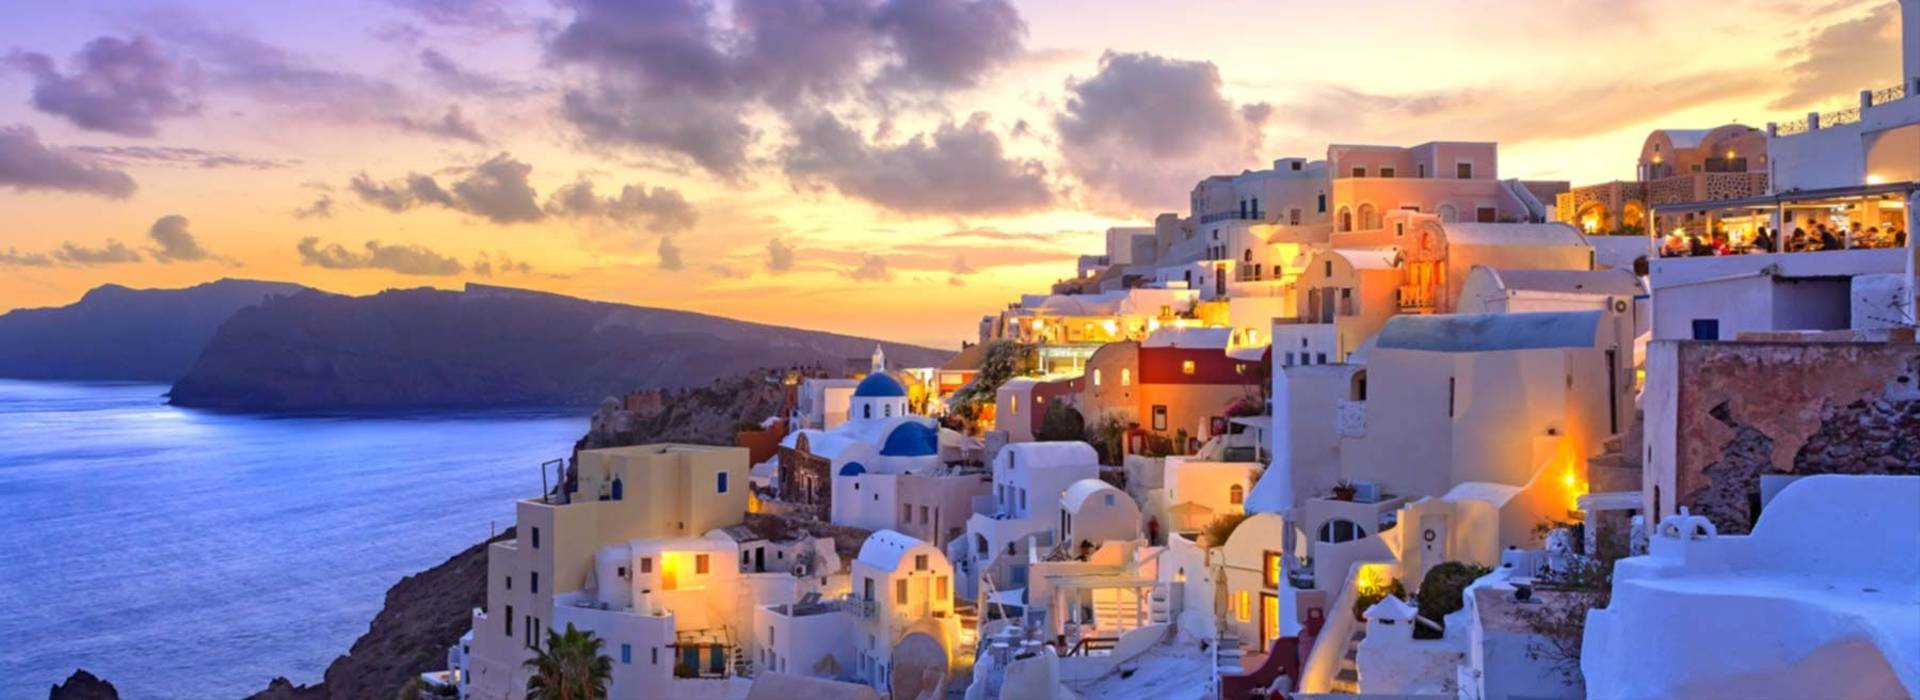 Europe Wellness Vacations